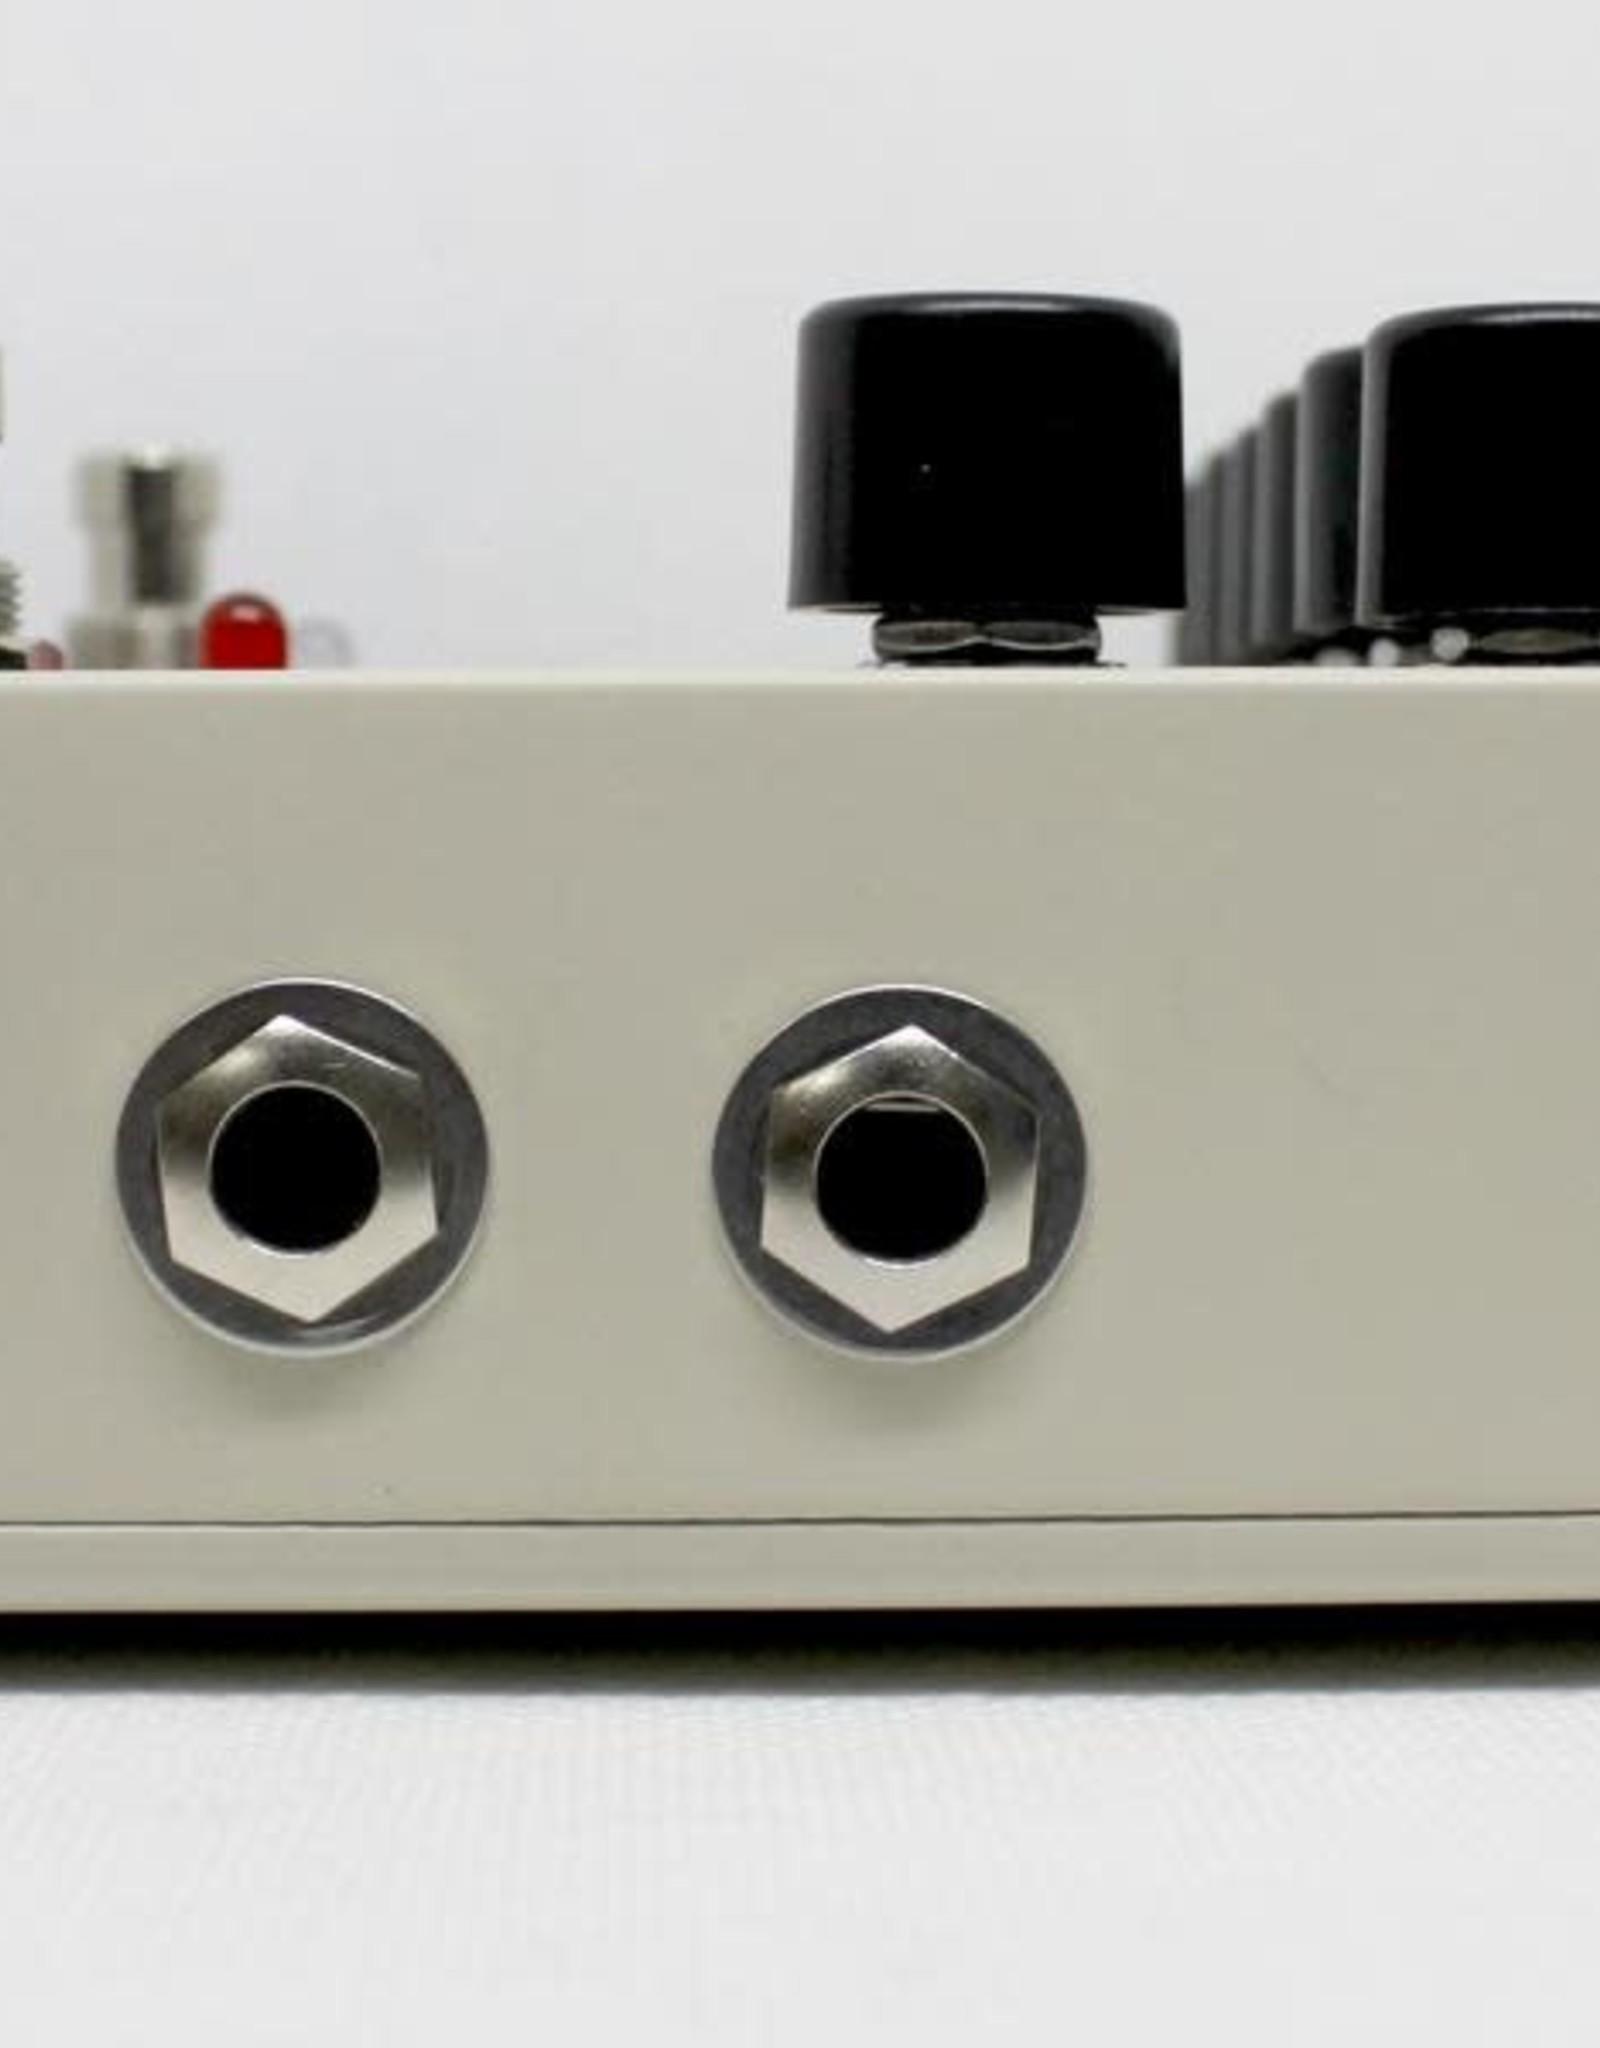 Electro-Harmonix Electro-Harmonix Sovtek Deluxe Big Muff - Distortion/Sustainer Battery Inc, 9.6DC-200 PSU optional